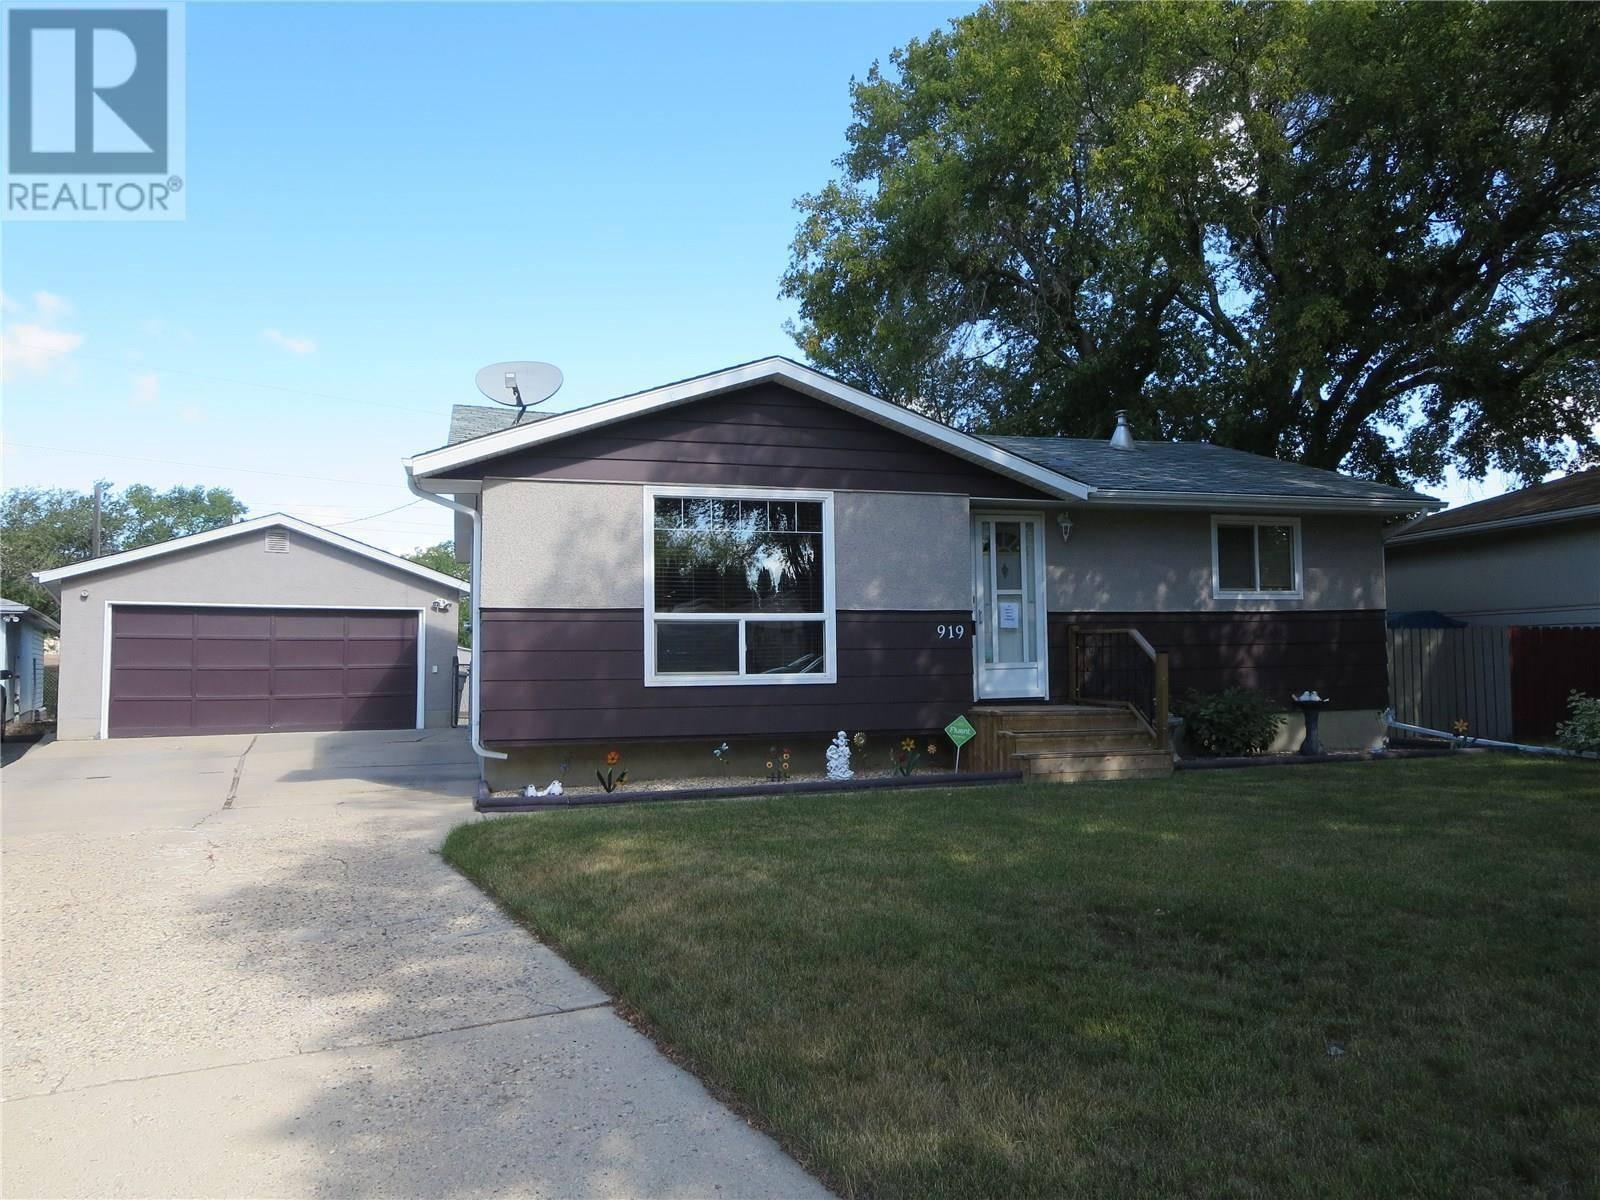 House for sale at 919 X Ave N Saskatoon Saskatchewan - MLS: SK785029